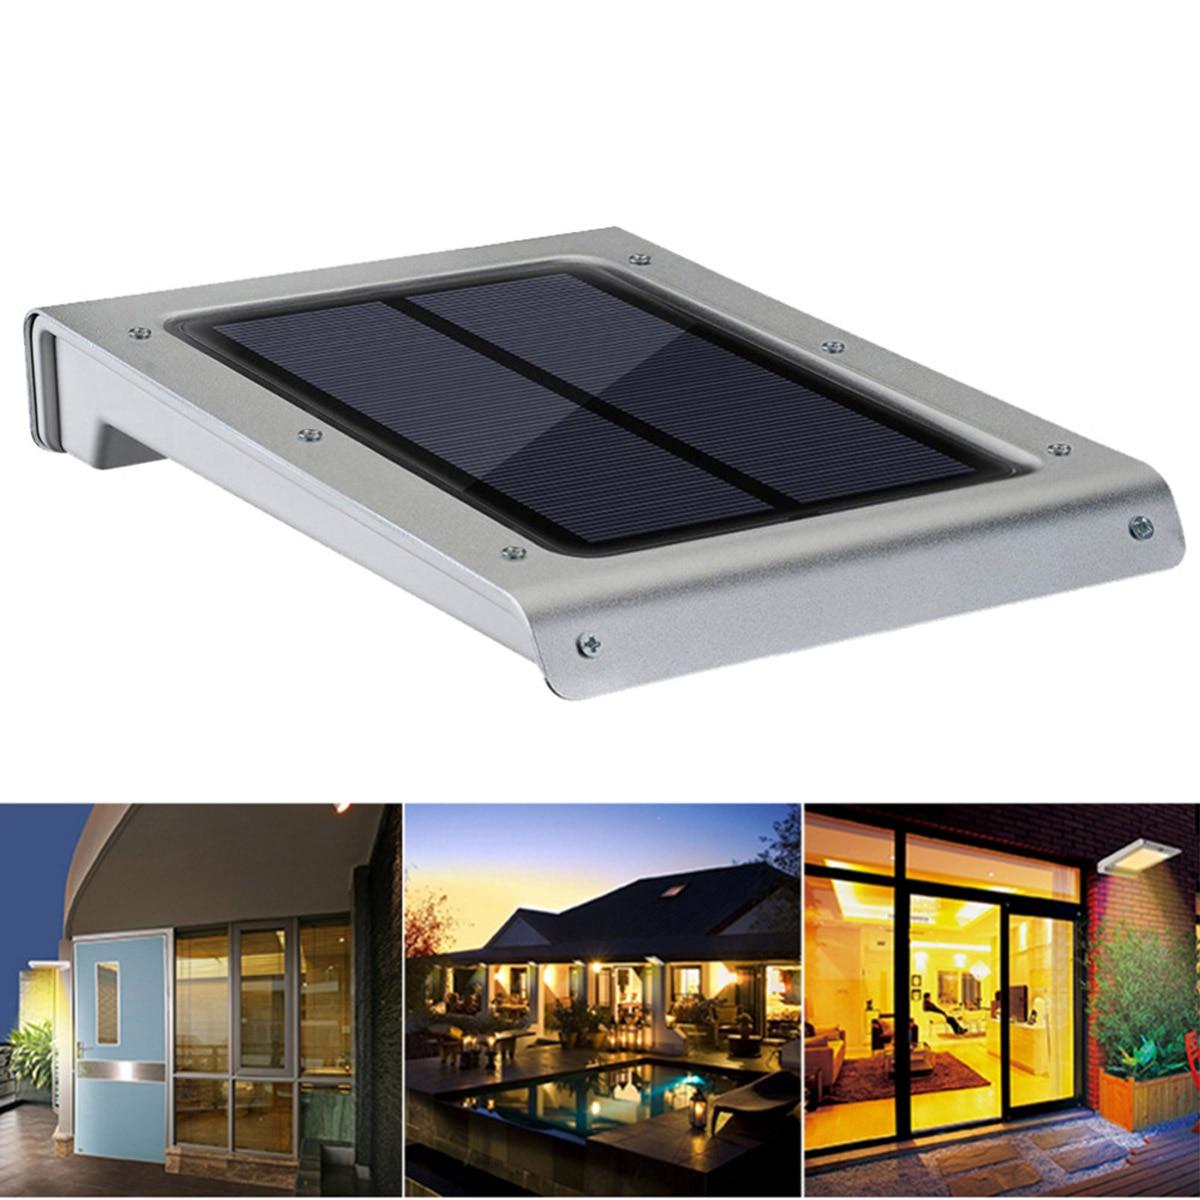 ФОТО Jiawen PIR Motion Sensor  Solar power LED Outdoor lamp ,Waterproof Garden Fence Wall Yard Path Security Lamps Series